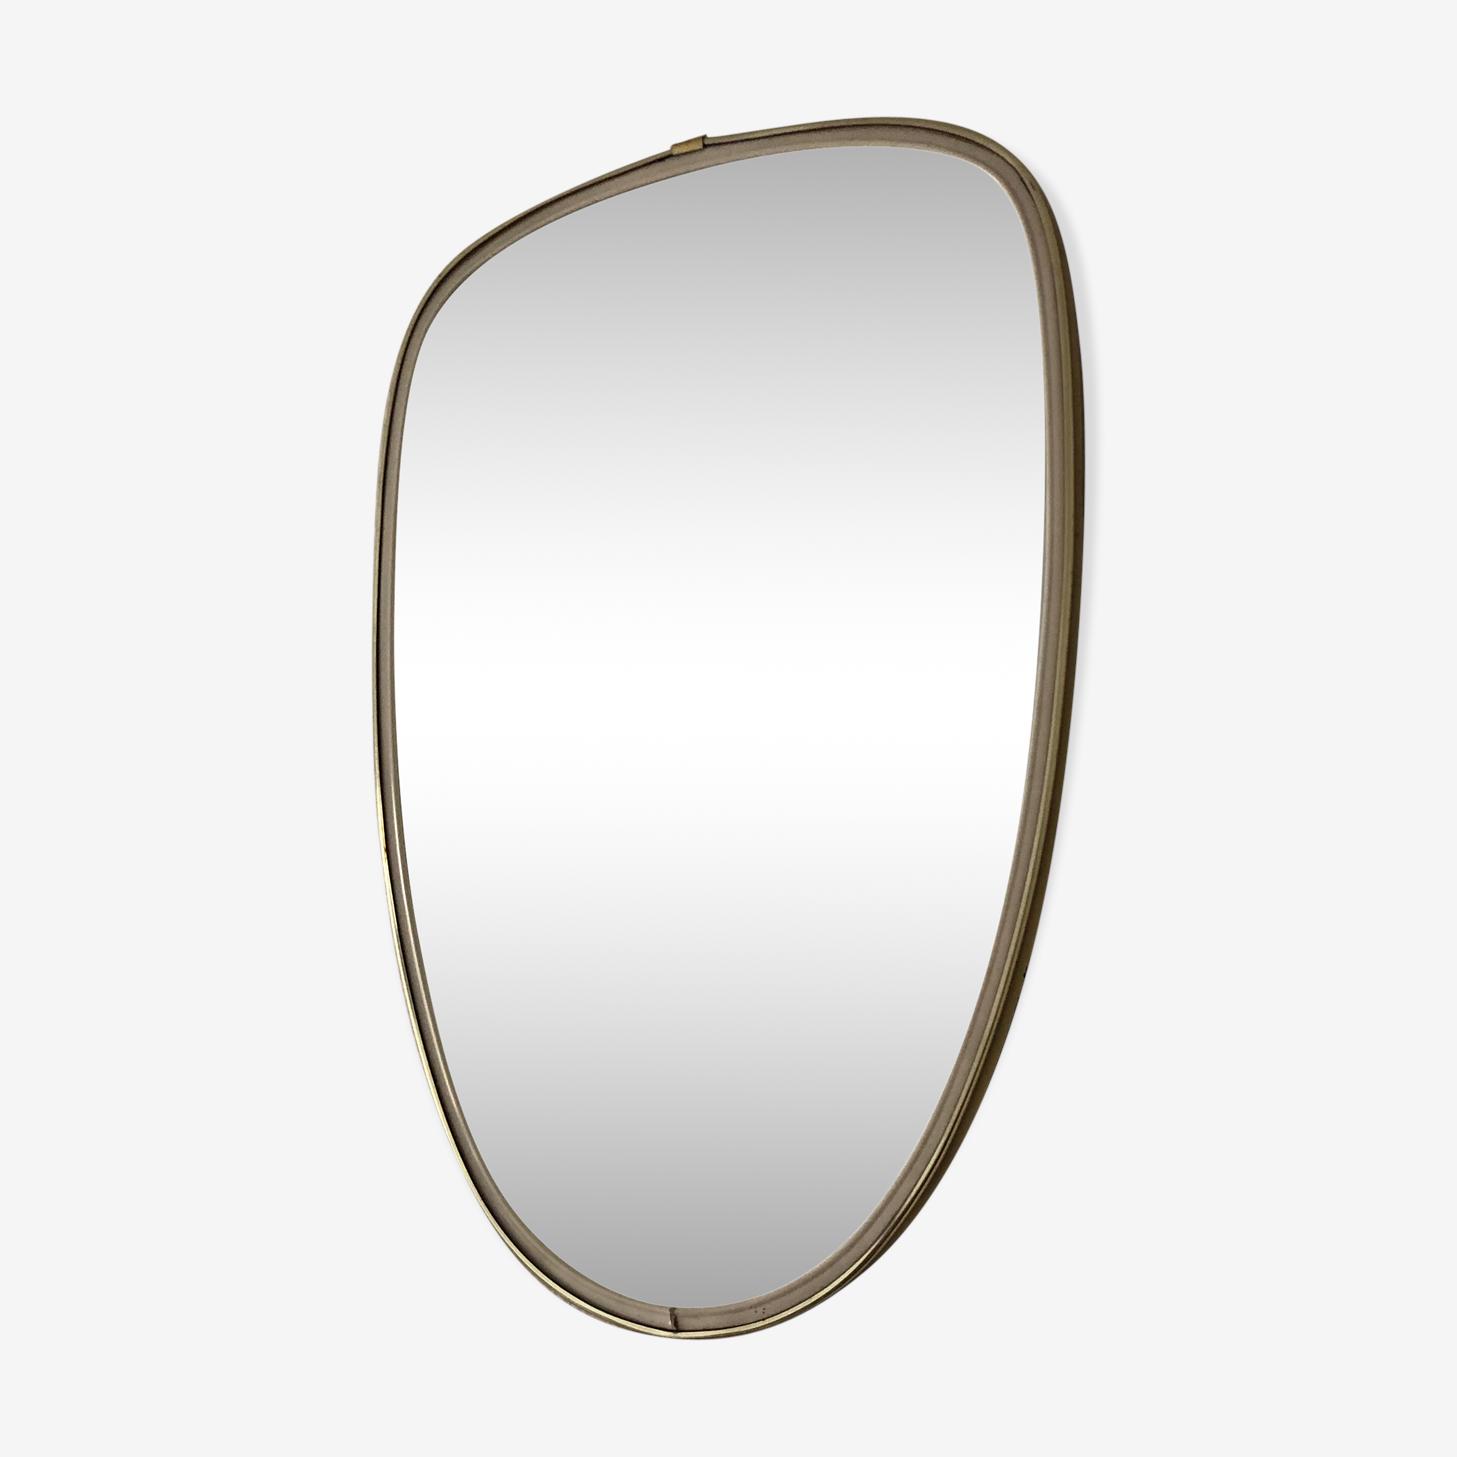 Vintage mirror 1960 40x27cm